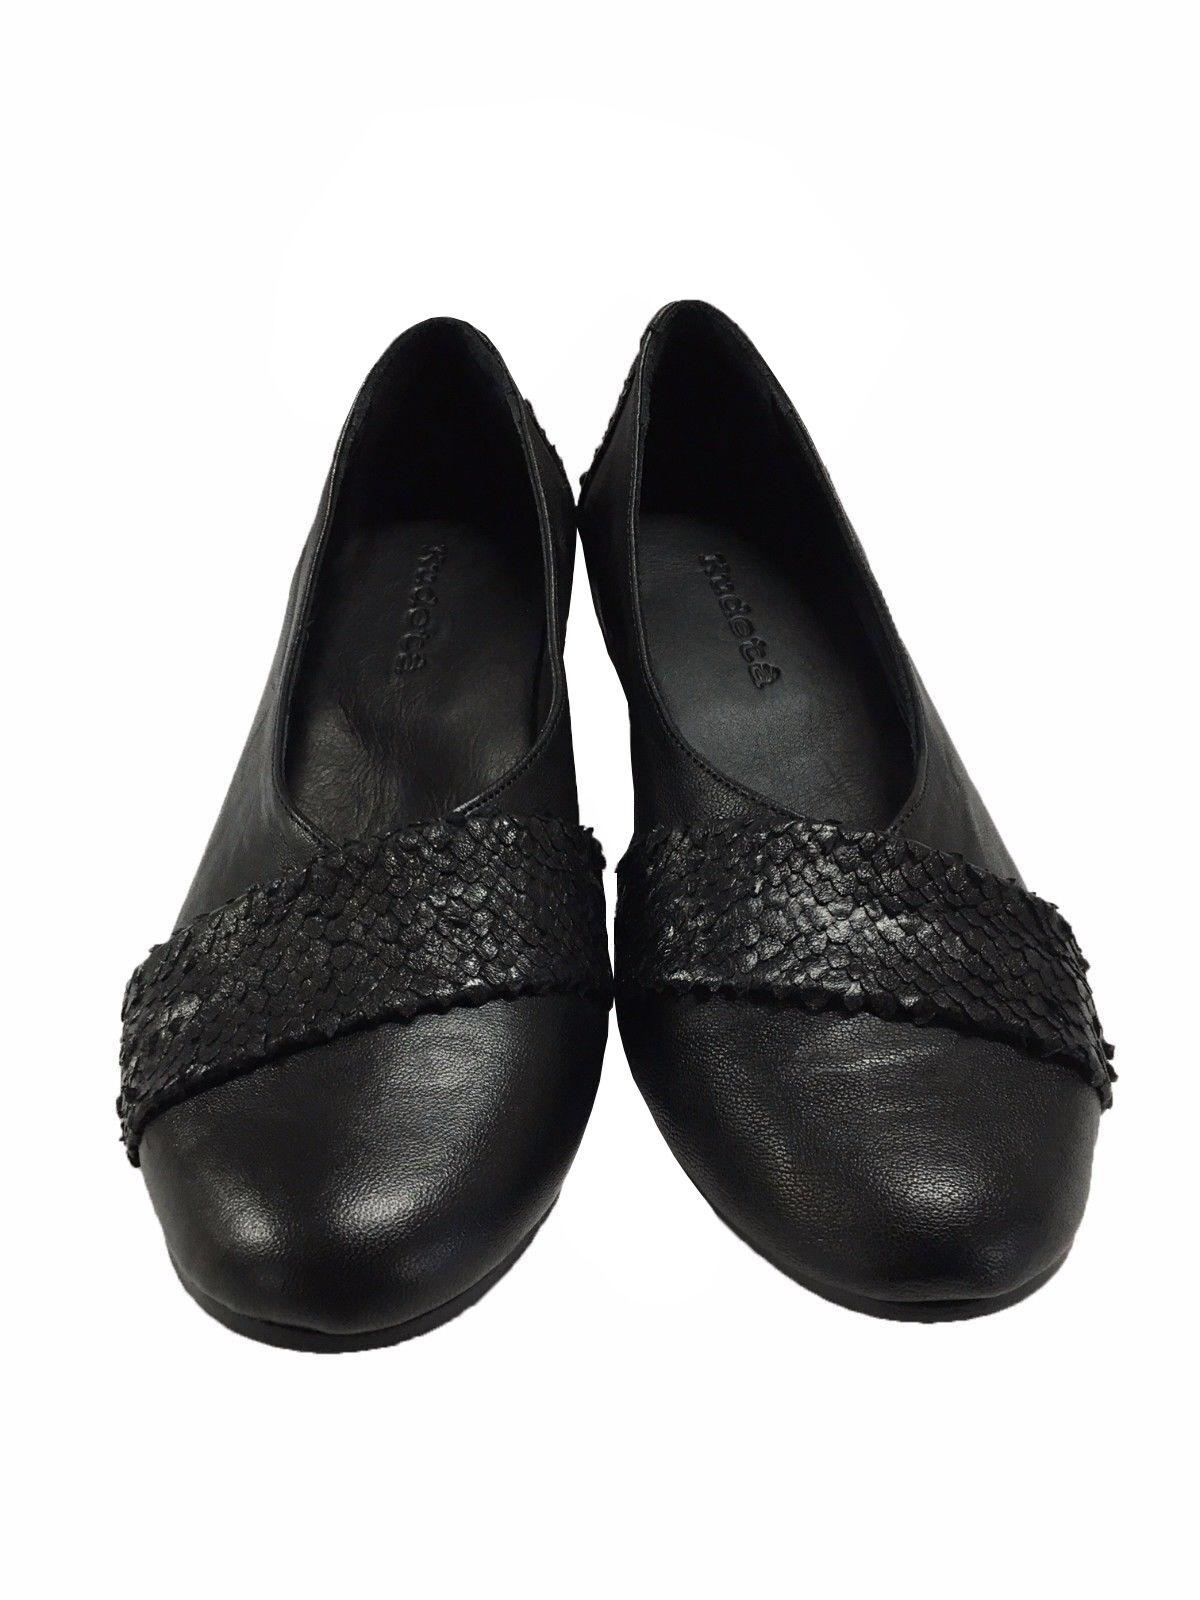 KUDETA' zapatos de mujer negro multi-material talón cm 3 3 3 mod 623403 972f97